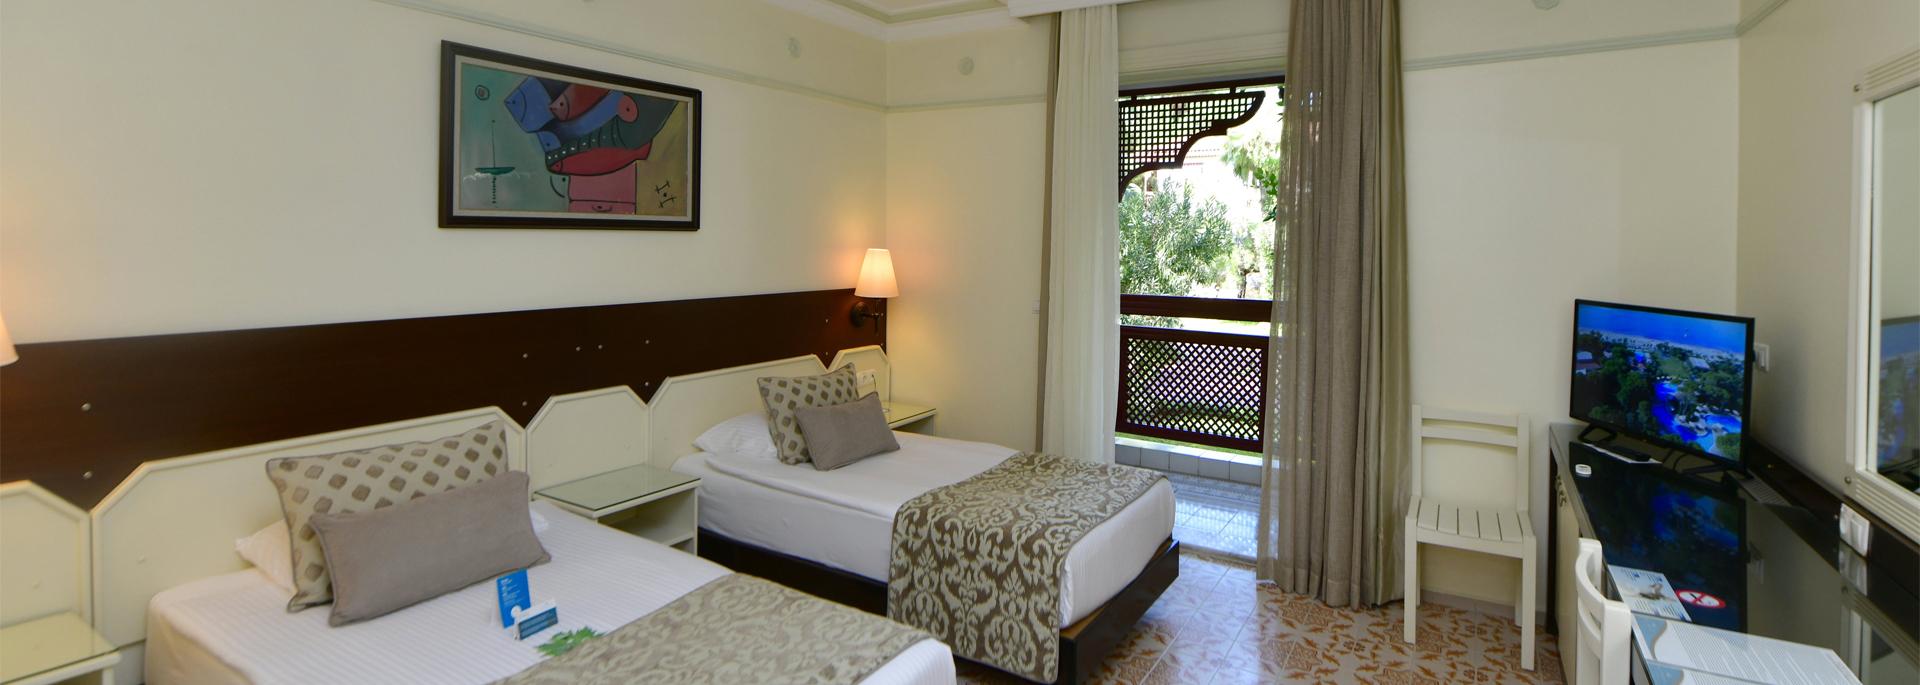 Ali Bey Park Manavgat - Standard Rooms